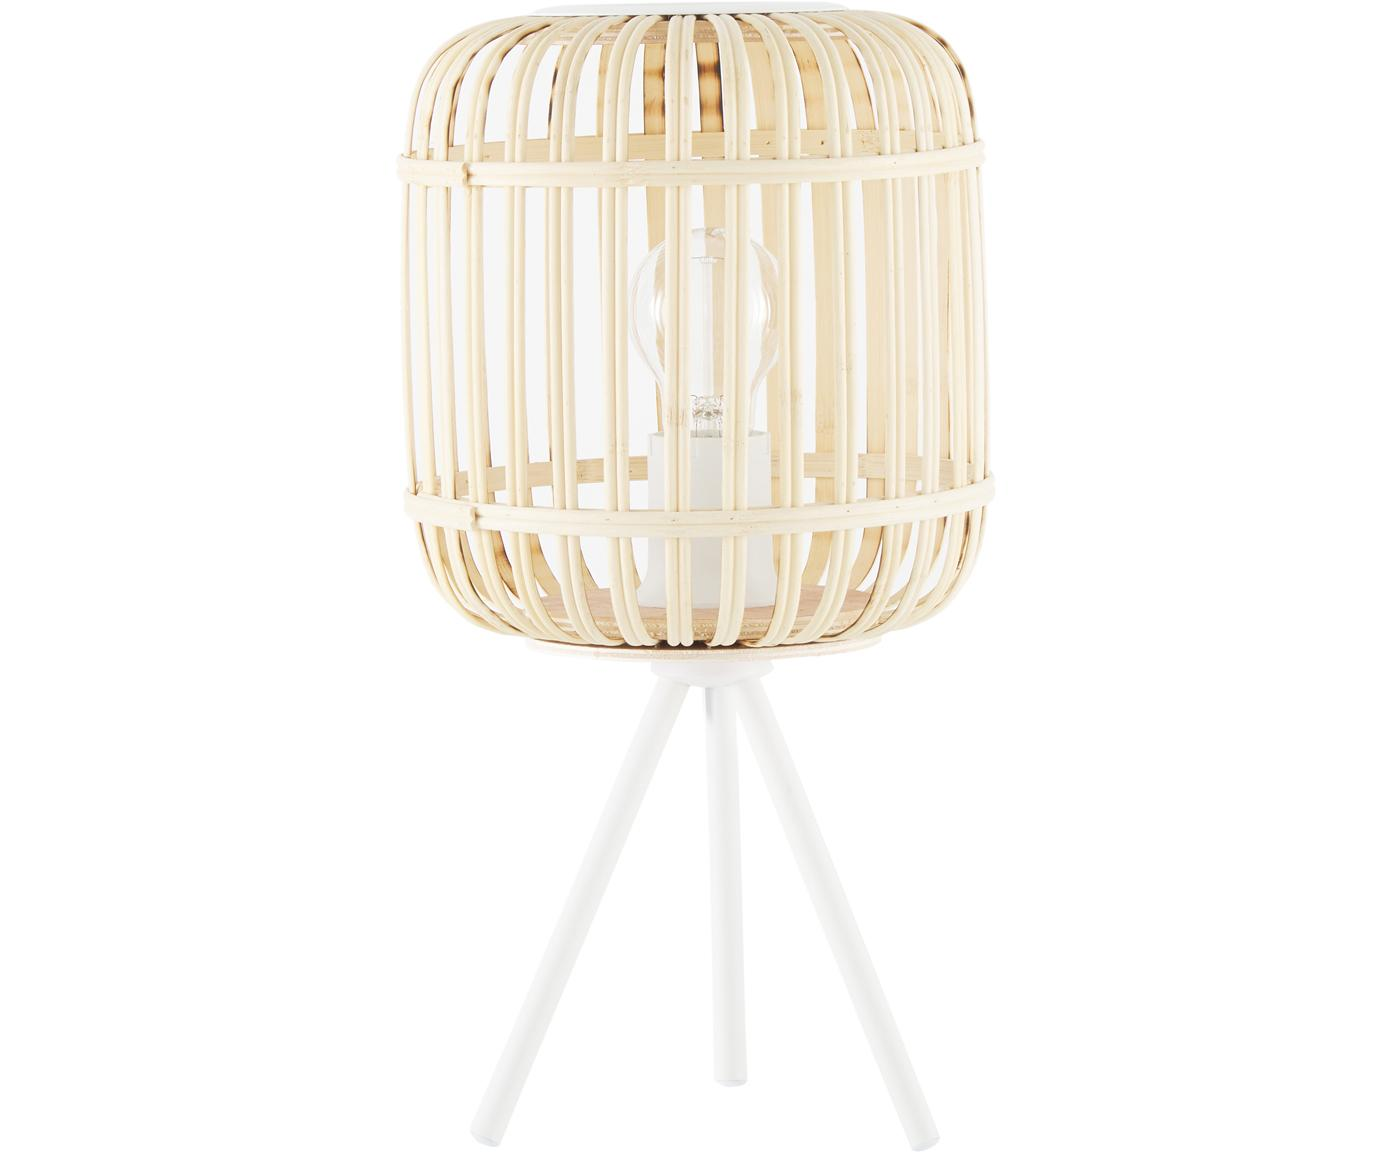 Tafellamp Adam van bamboehout, Lampenkap: bamboe, Lampvoet: gepoedercoat metaal, Wit, beige, Ø 21 x H 42 cm